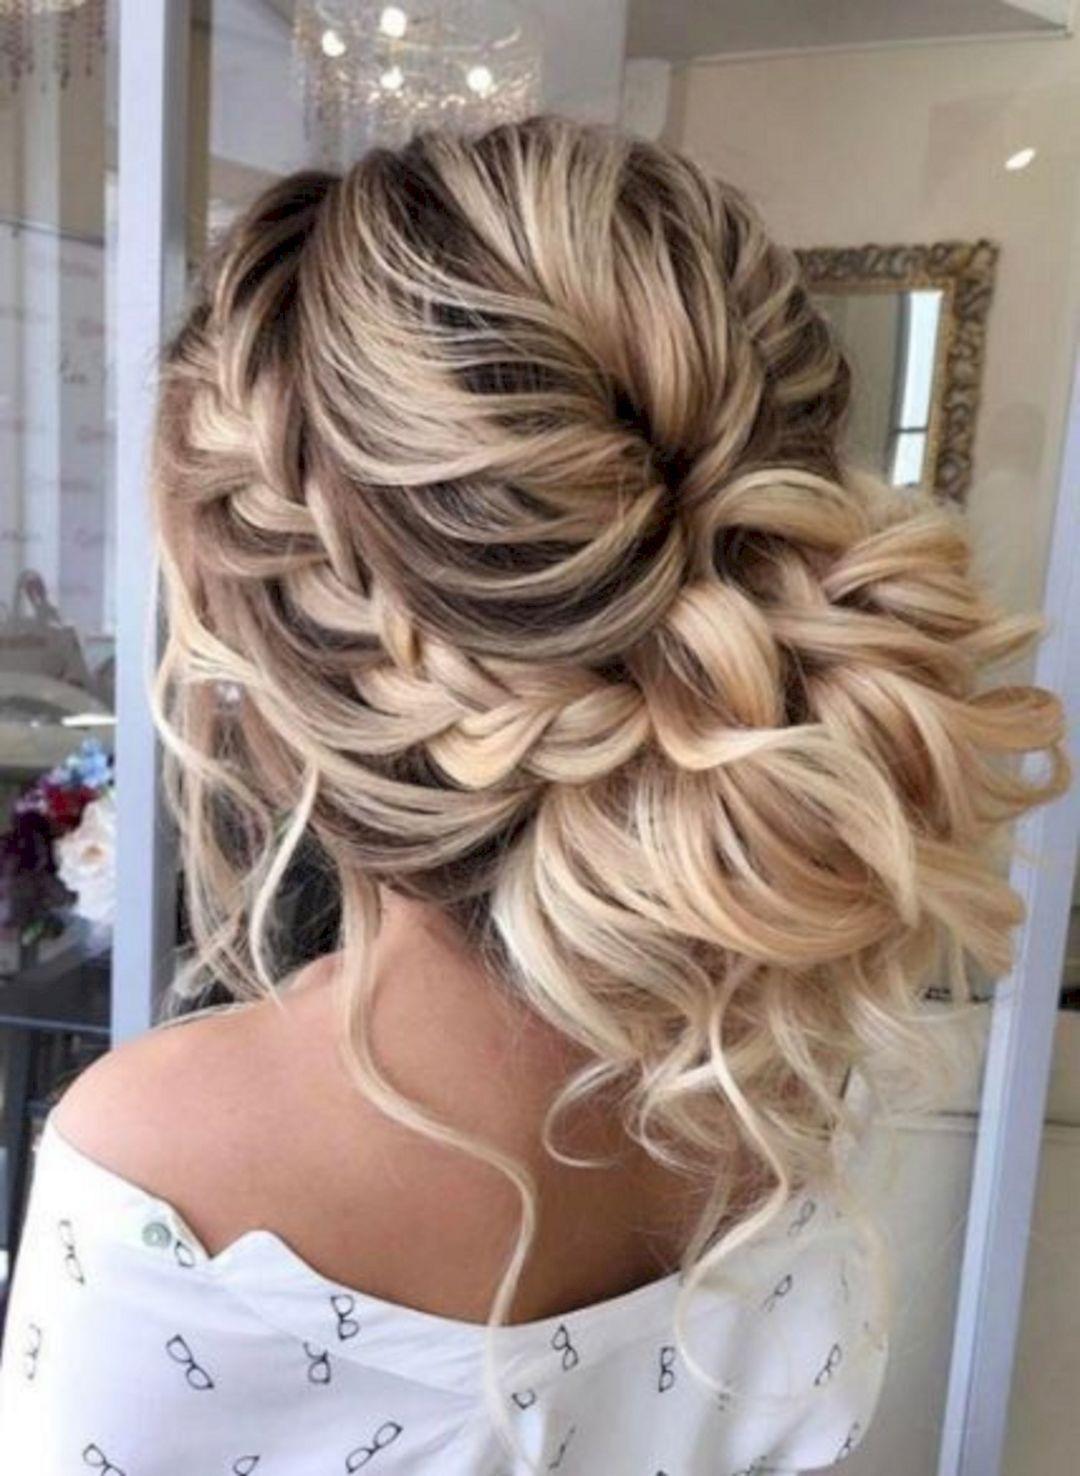 Bridesmaids Hairstyles  Wedding Bridesmaid Hairstyles for Long Hair – OOSILE